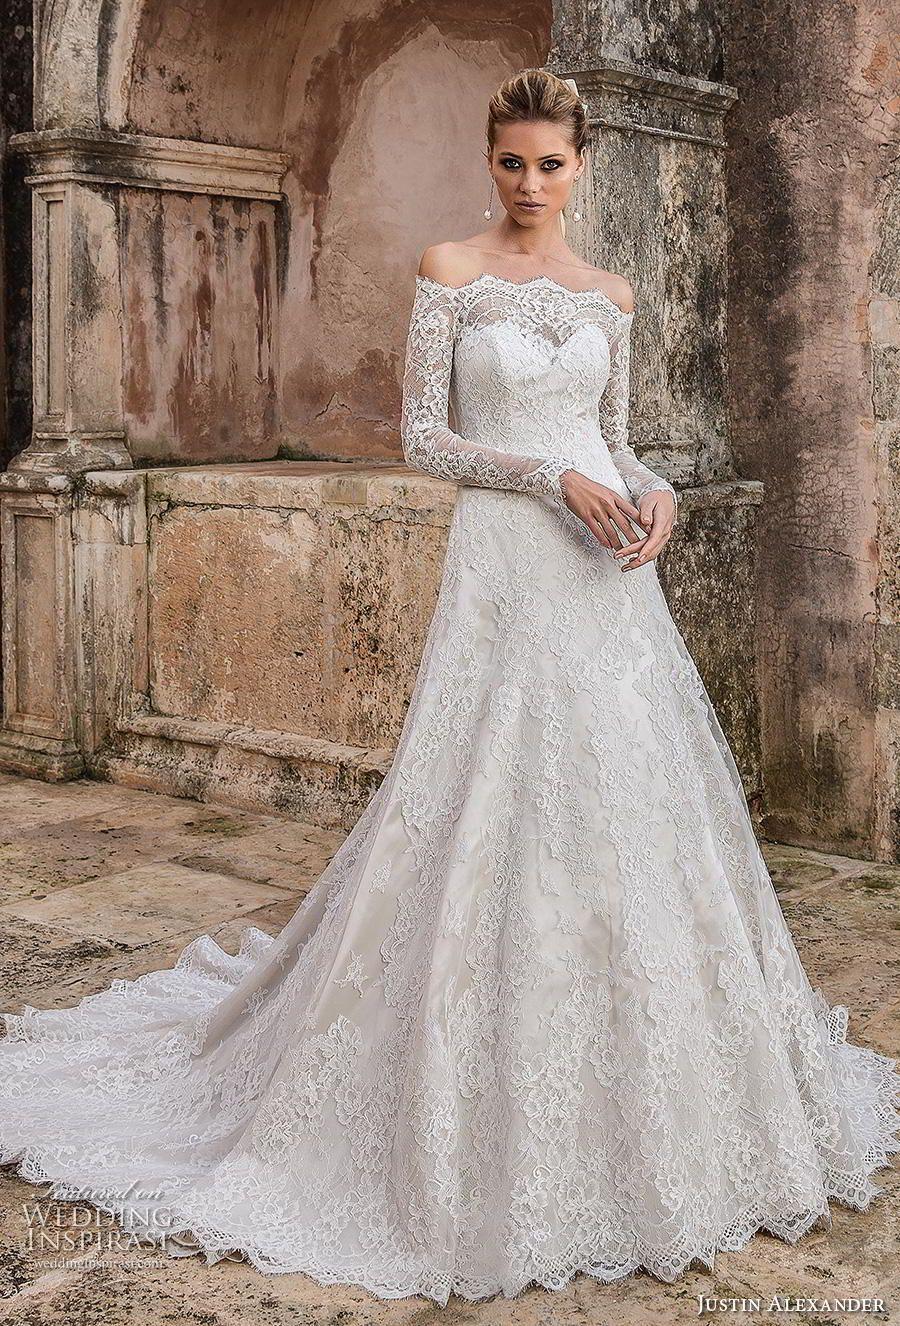 Justin Alexander Spring 2019 Wedding Dresses Wedding Inspirasi Justin Alexander Wedding Dress Wedding Dresses Lace Justin Alexander Bridal [ 1326 x 900 Pixel ]